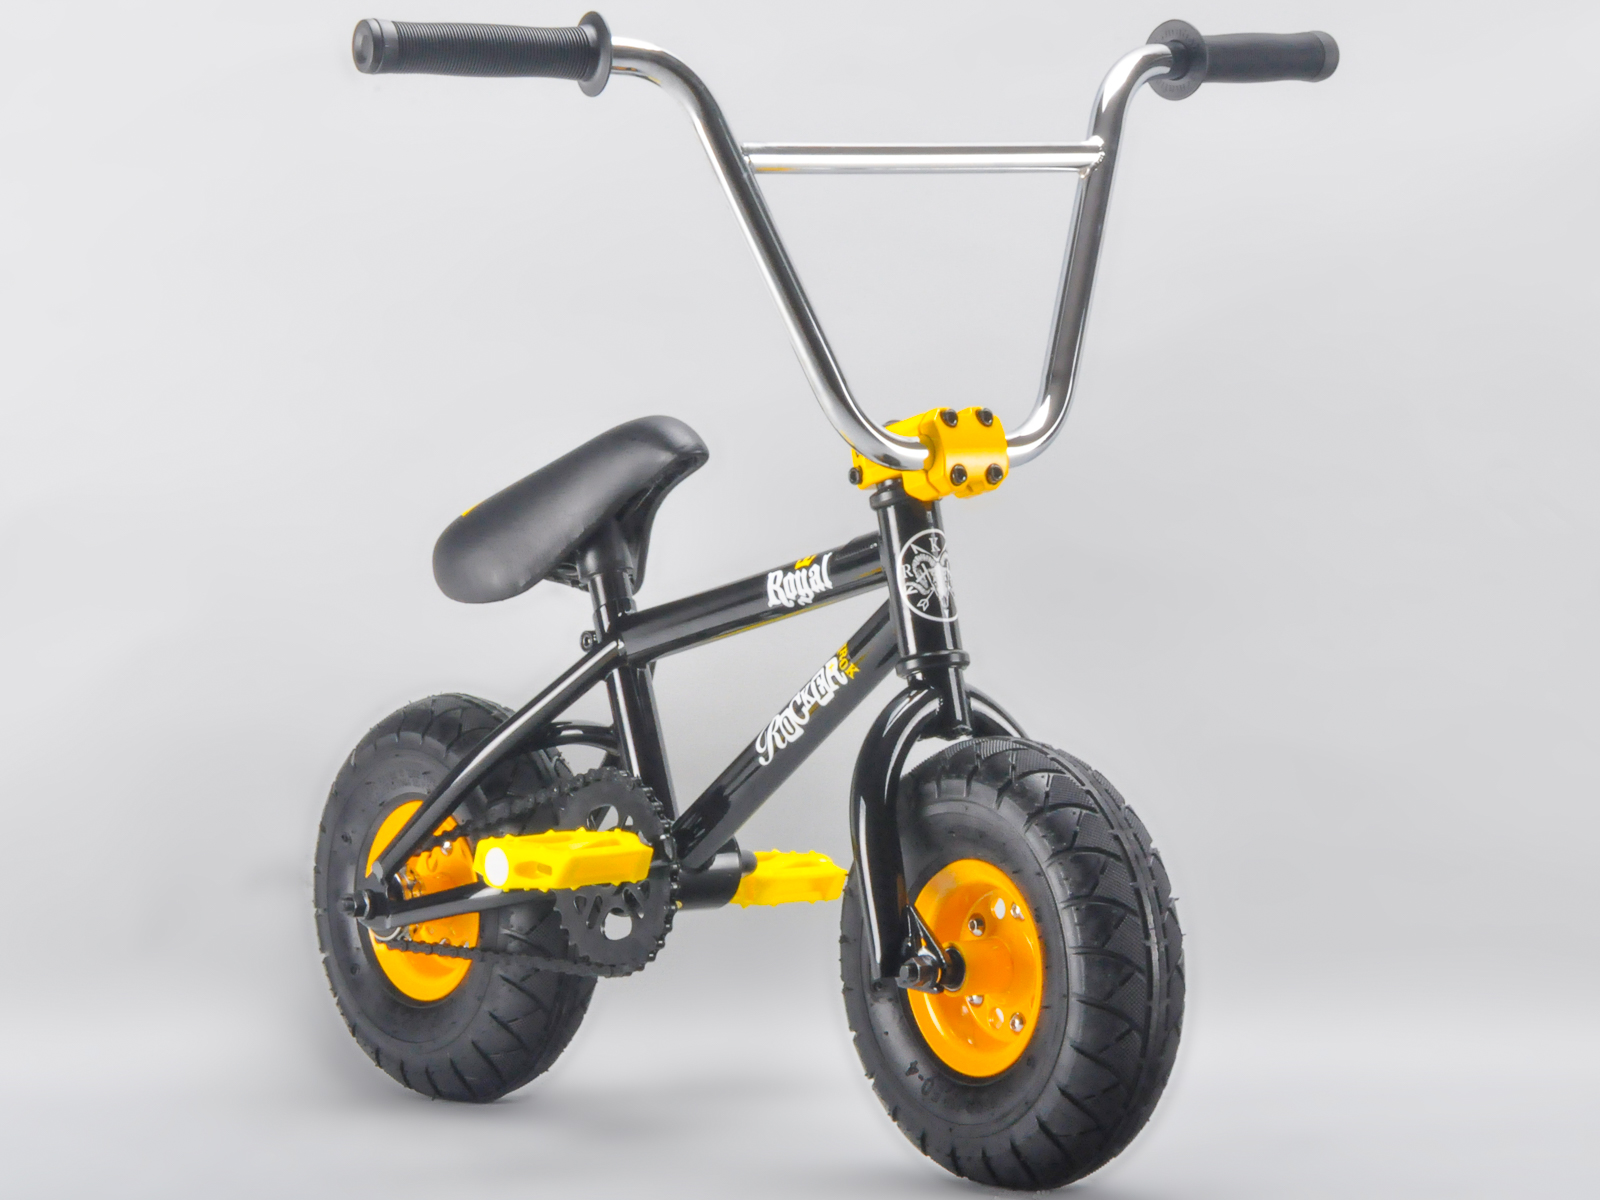 rocker bmx mini bmx bike royal irok rkr ebay. Black Bedroom Furniture Sets. Home Design Ideas